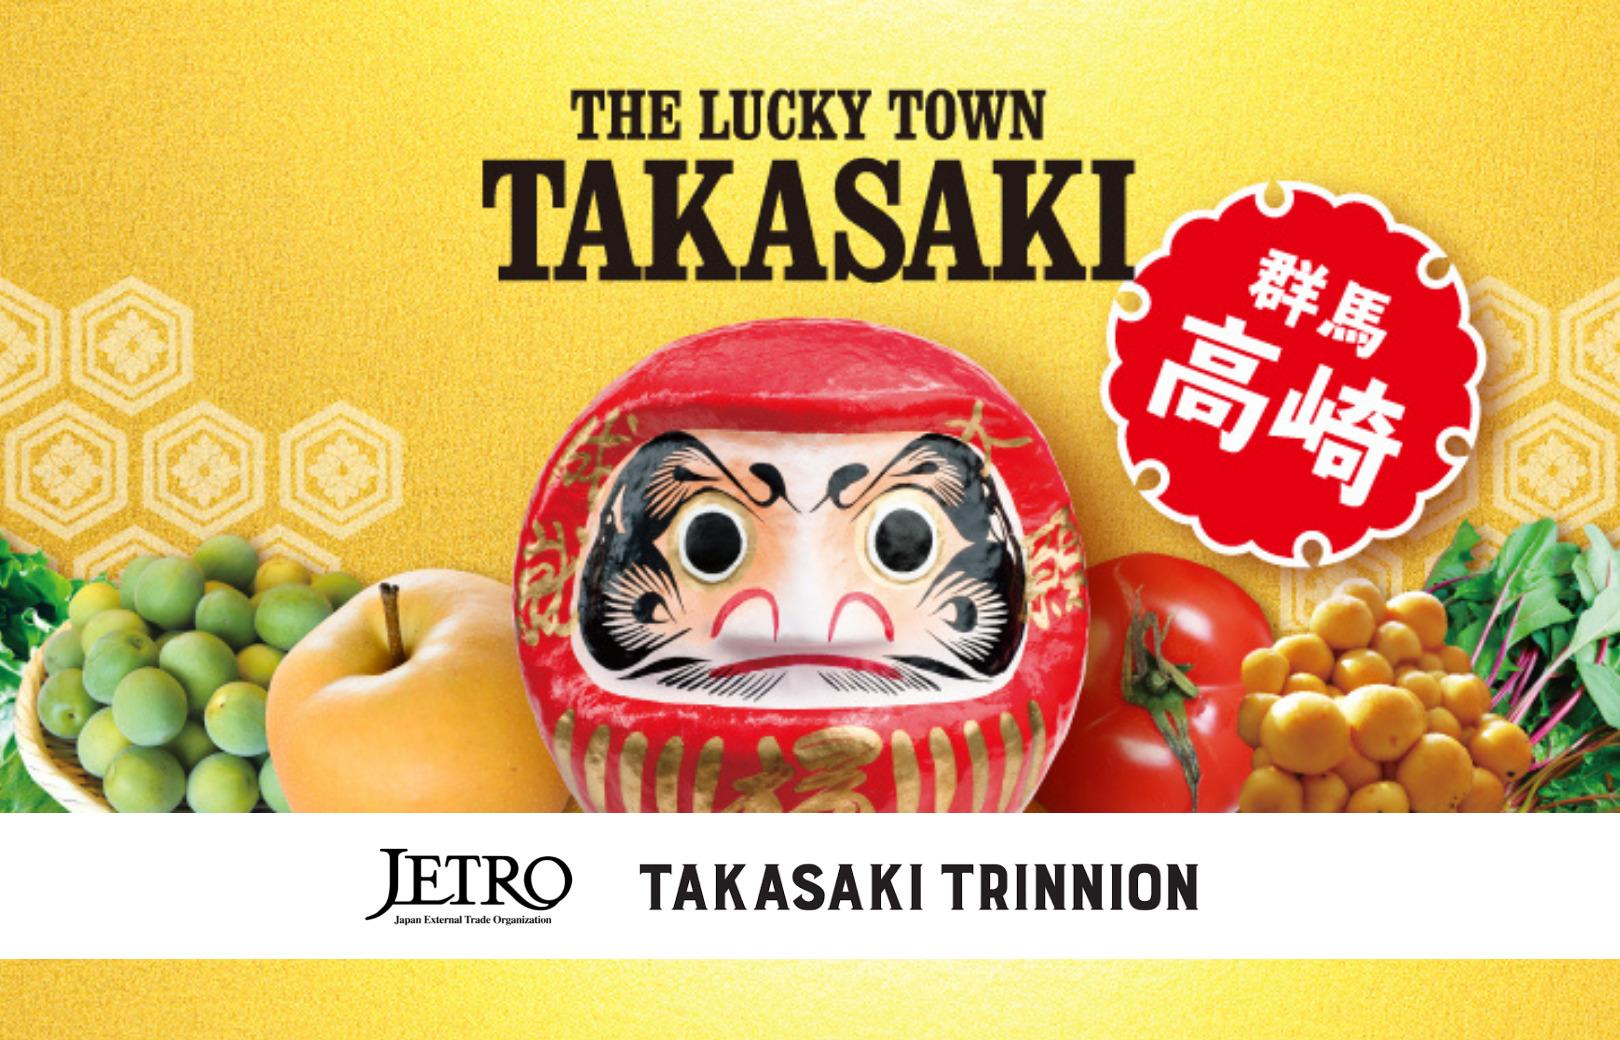 Takasaki Pop-up Store is Back!